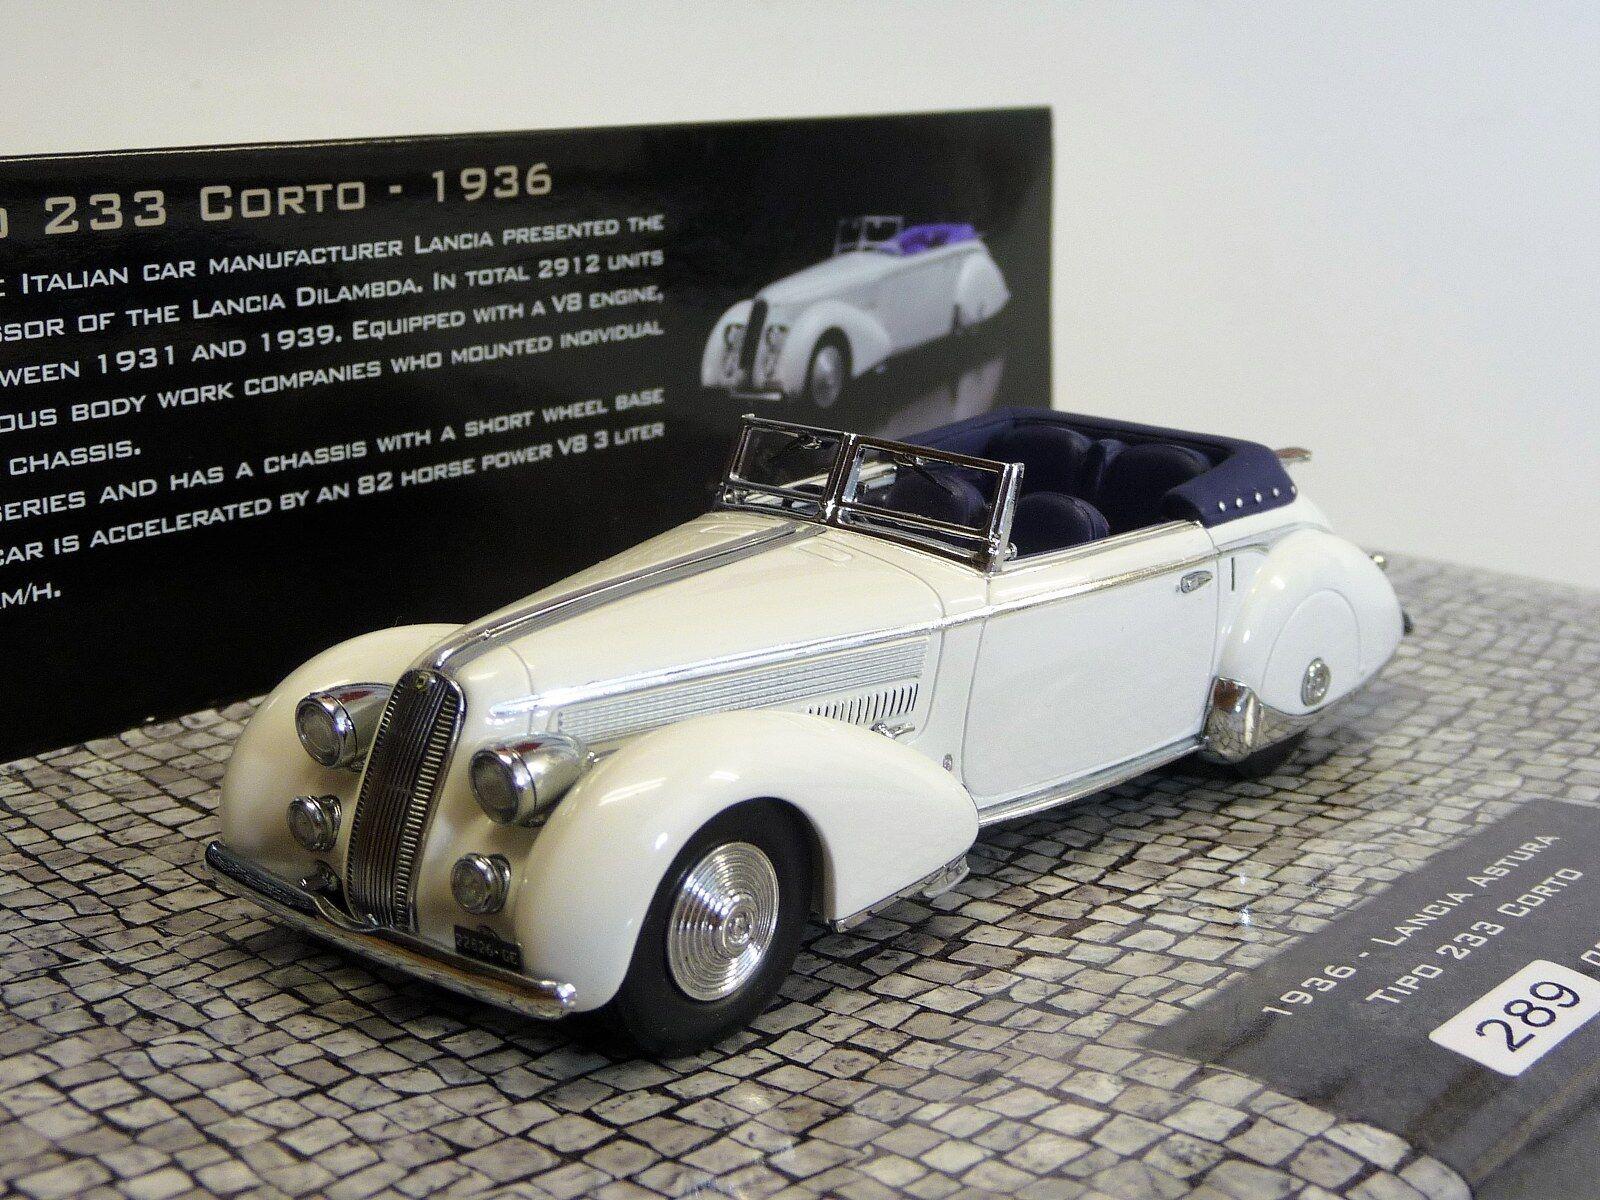 Lancia Astura typo 233 corto 1936 Minichamps 437125330 en OVP 1 43